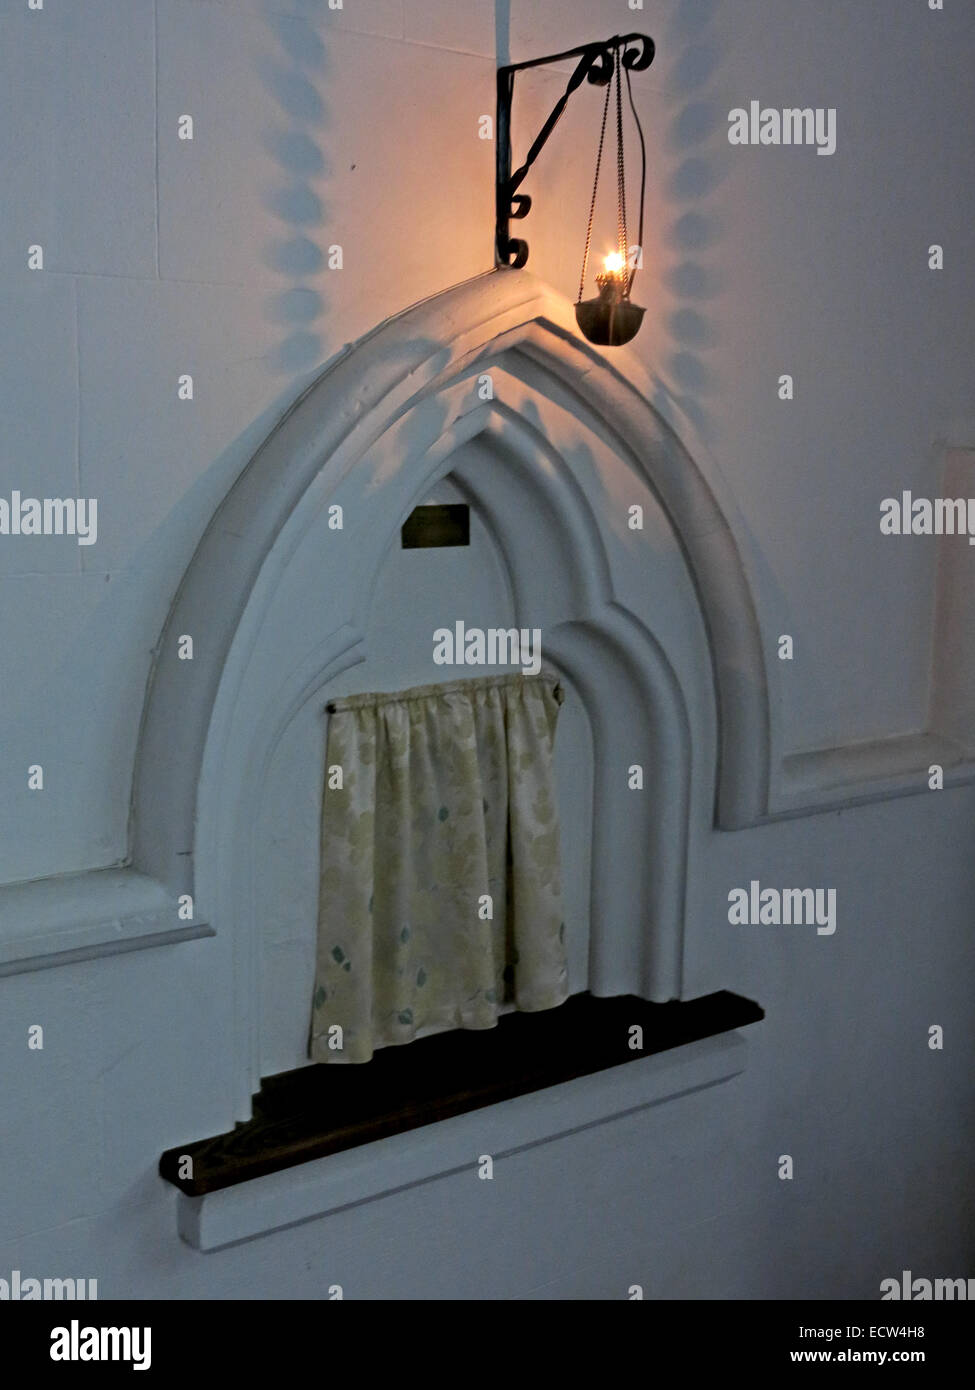 Laden Sie dieses Alamy Stockfoto Holy Trinity Church Woodgreen Witney beleuchtet Tabernakel, West Oxfordshire, England, UK - ECW4H8